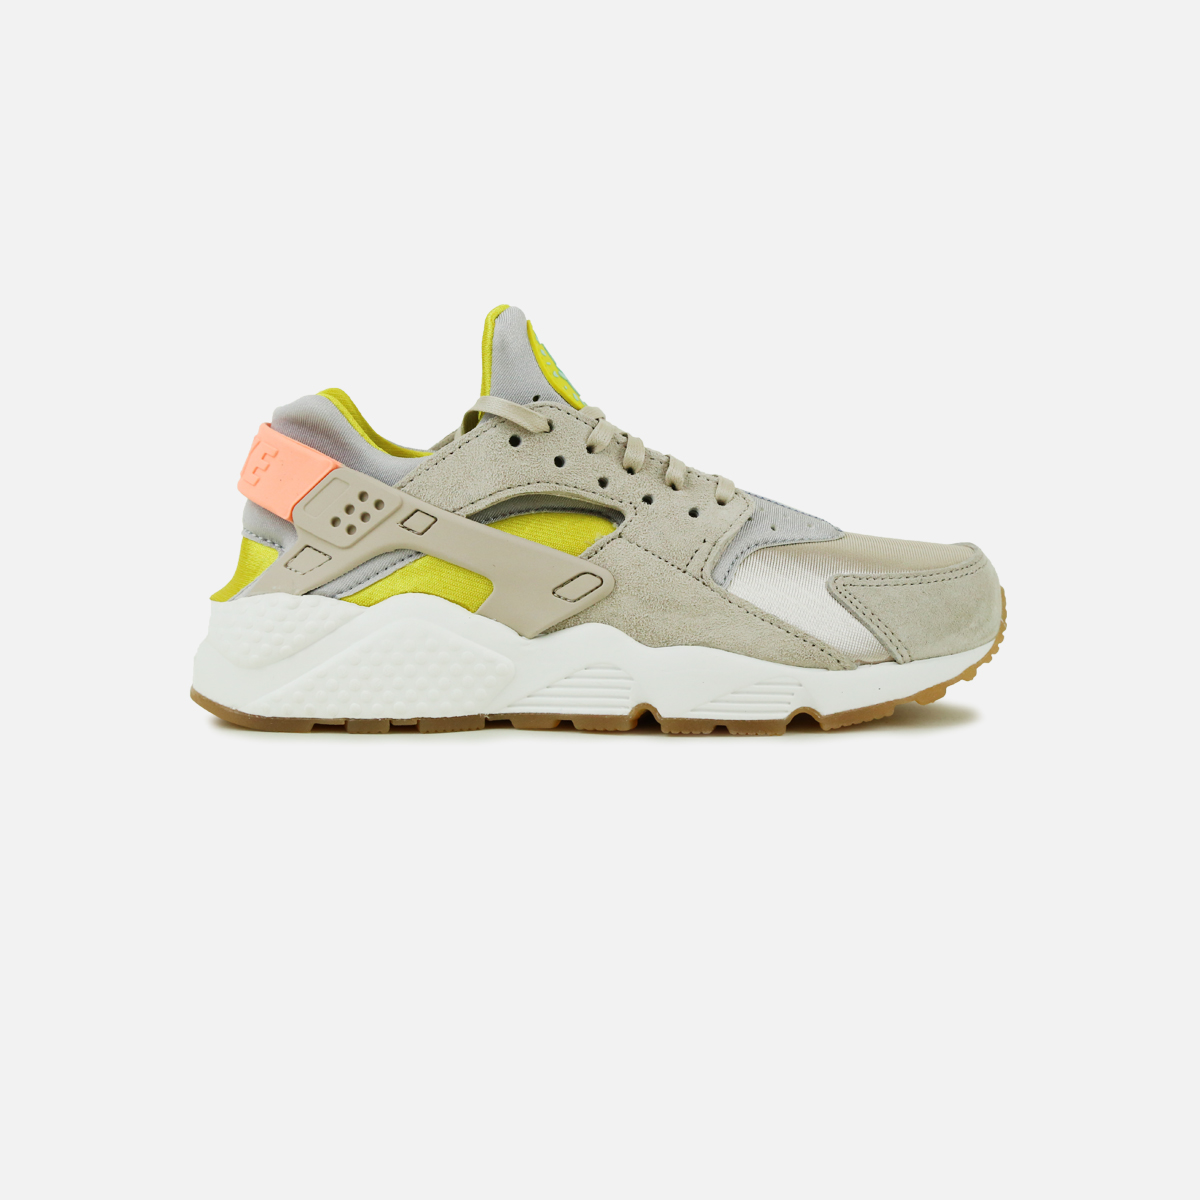 sports shoes 8f22b a0a20 Nike Air Huarache Run (Metallic Silver Sunset Glow-Green)   VILLA